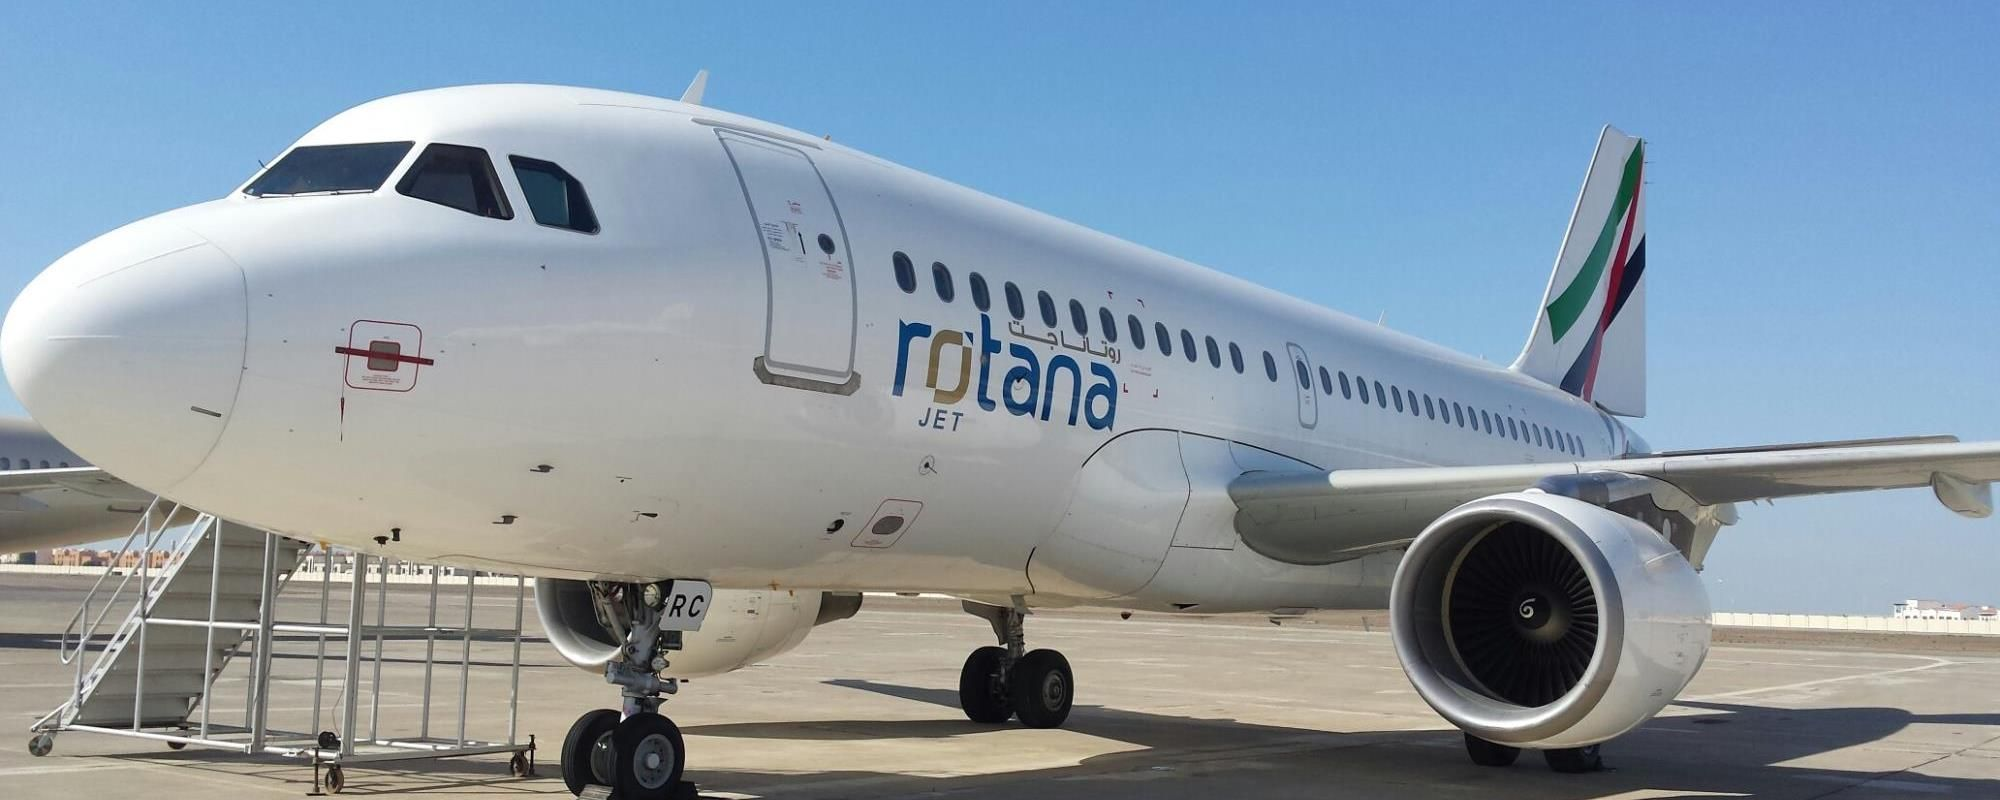 Авиакомпания Rotana Jet